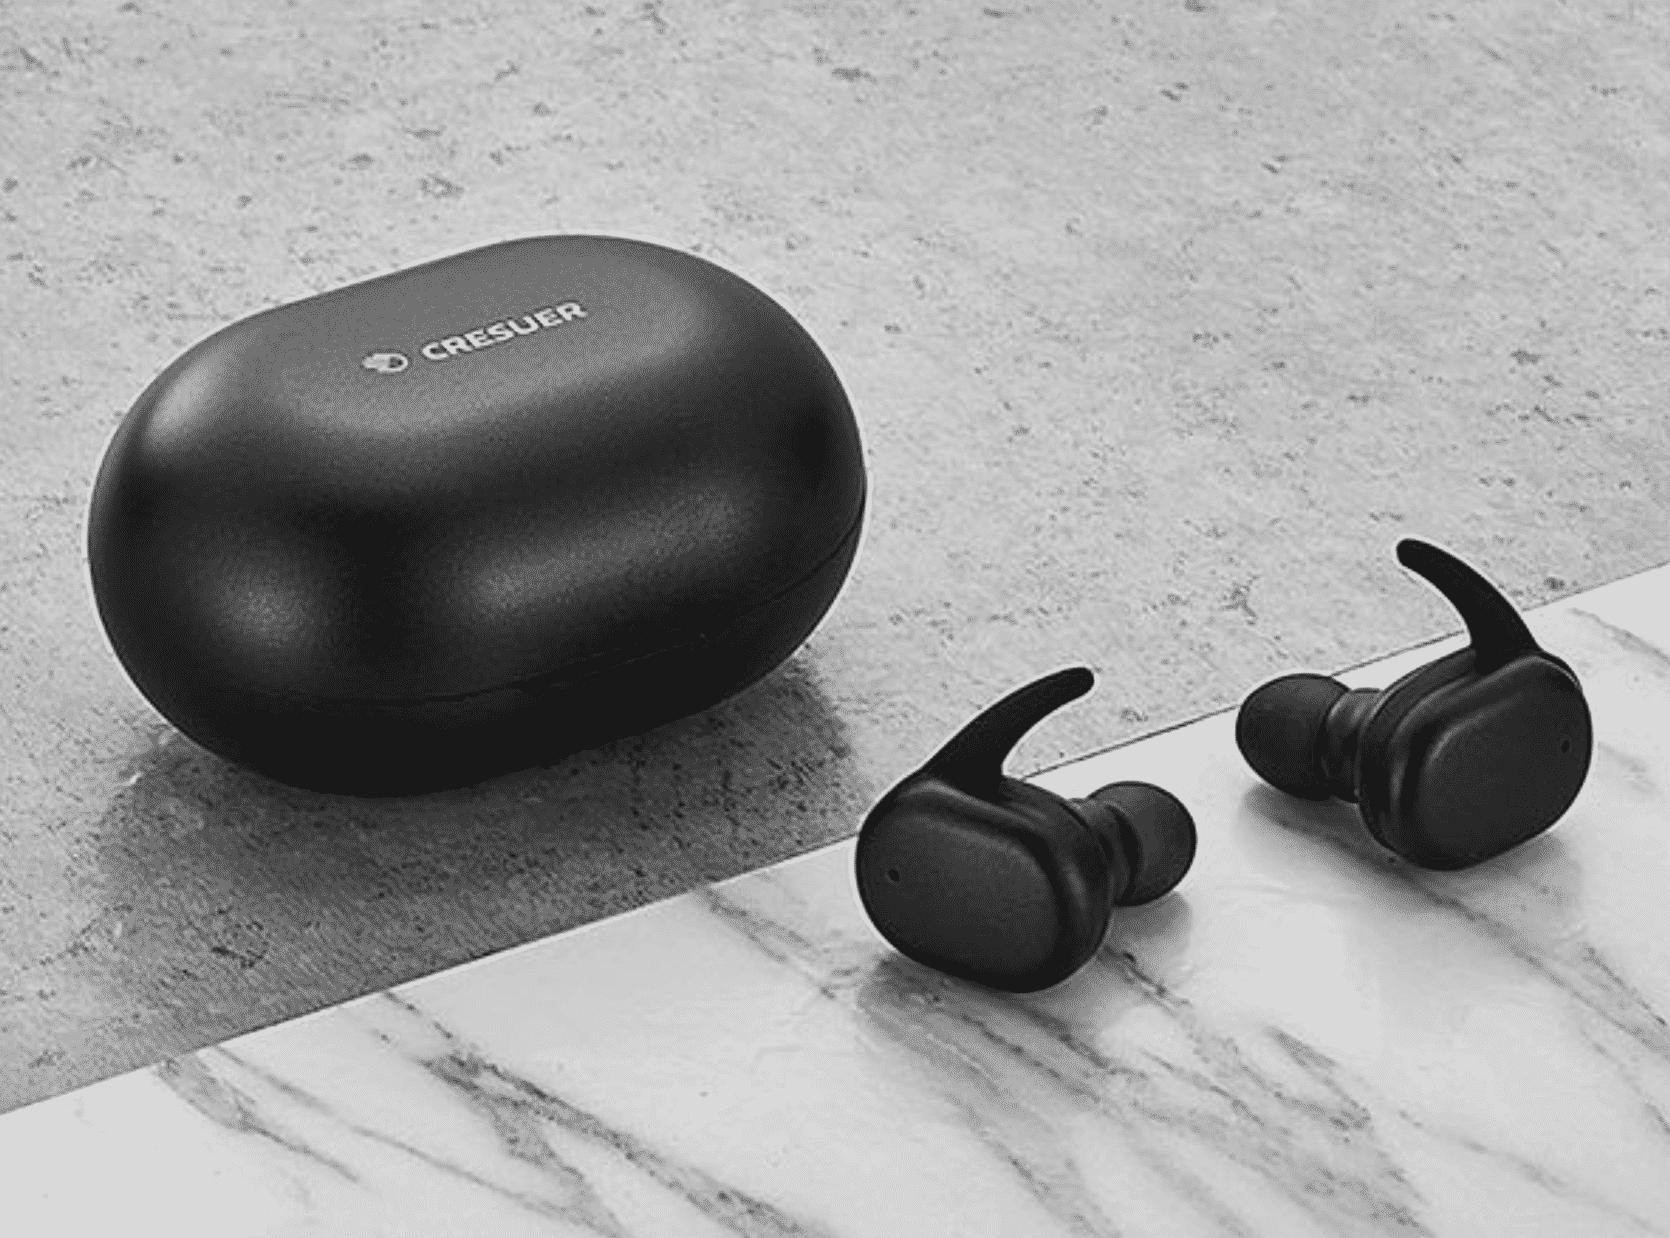 CRESUER TOUCHWAVE True Wireless Stereo Earbuds